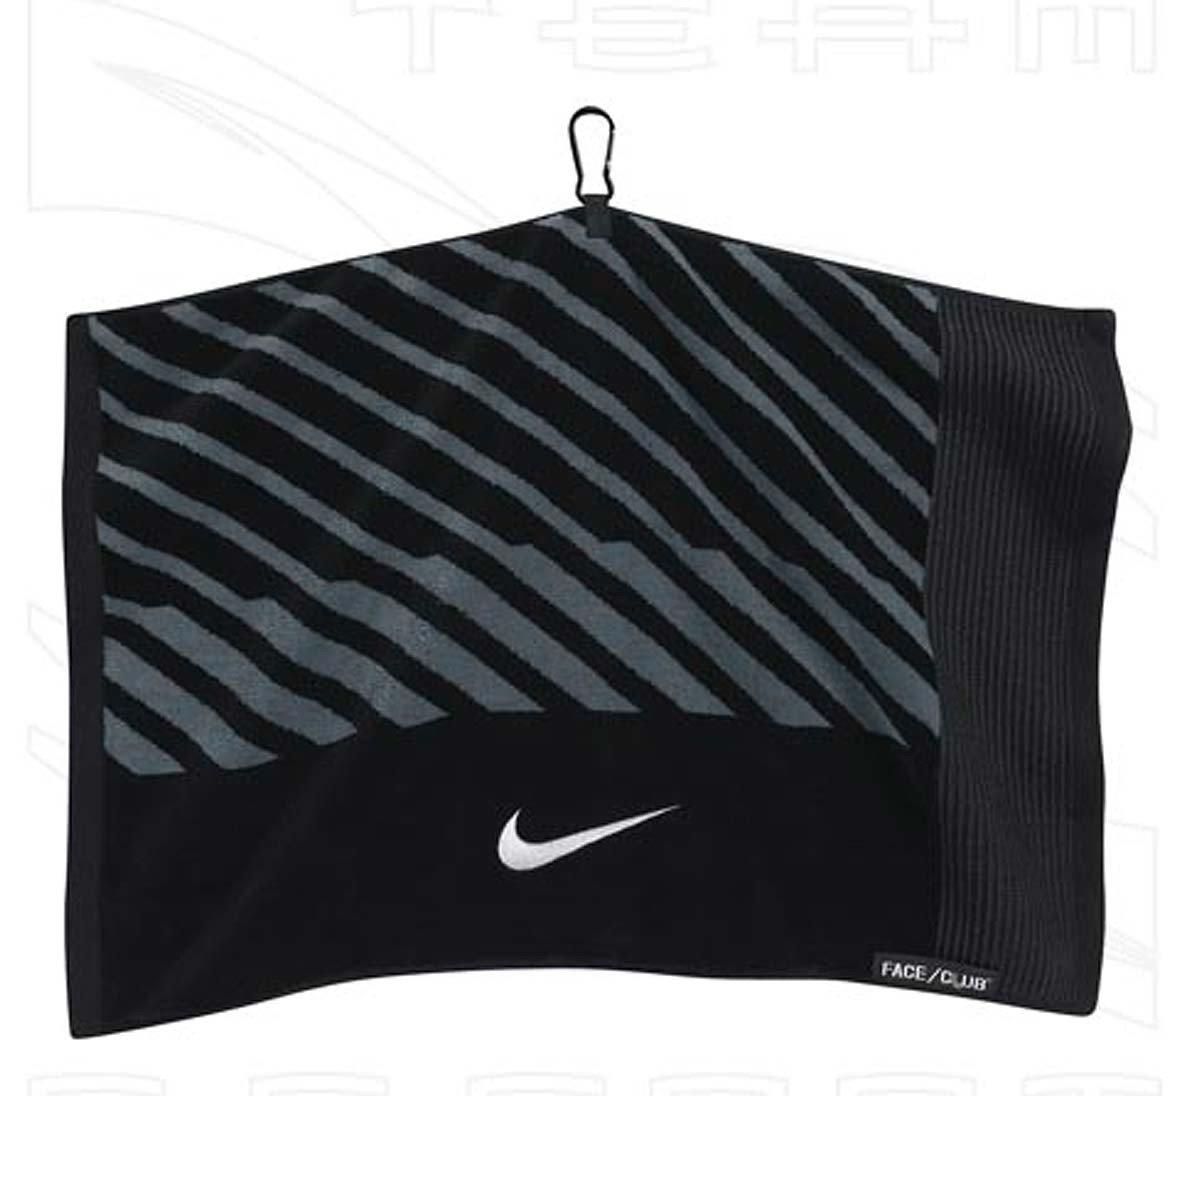 Nike Gym Sweat Towel: Best Rated In Sports Fan Golf Bag Towels & Helpful